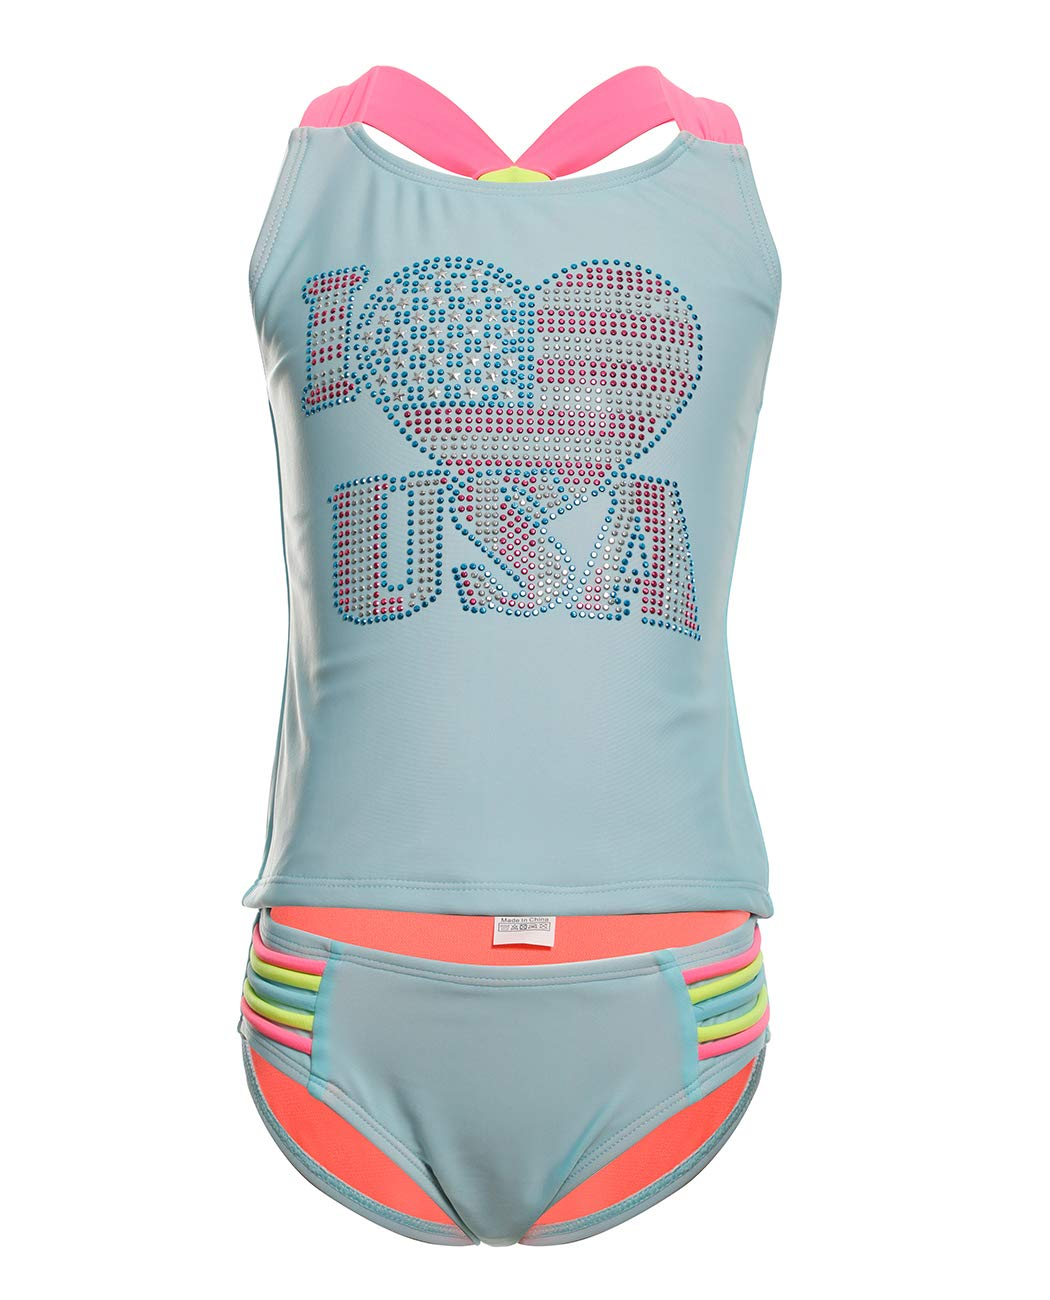 iDrawl Girls Swimsuit Two Pieces Swimsuit Bikini Bathing Suits, Tankini Set Beach Sport Swimwear